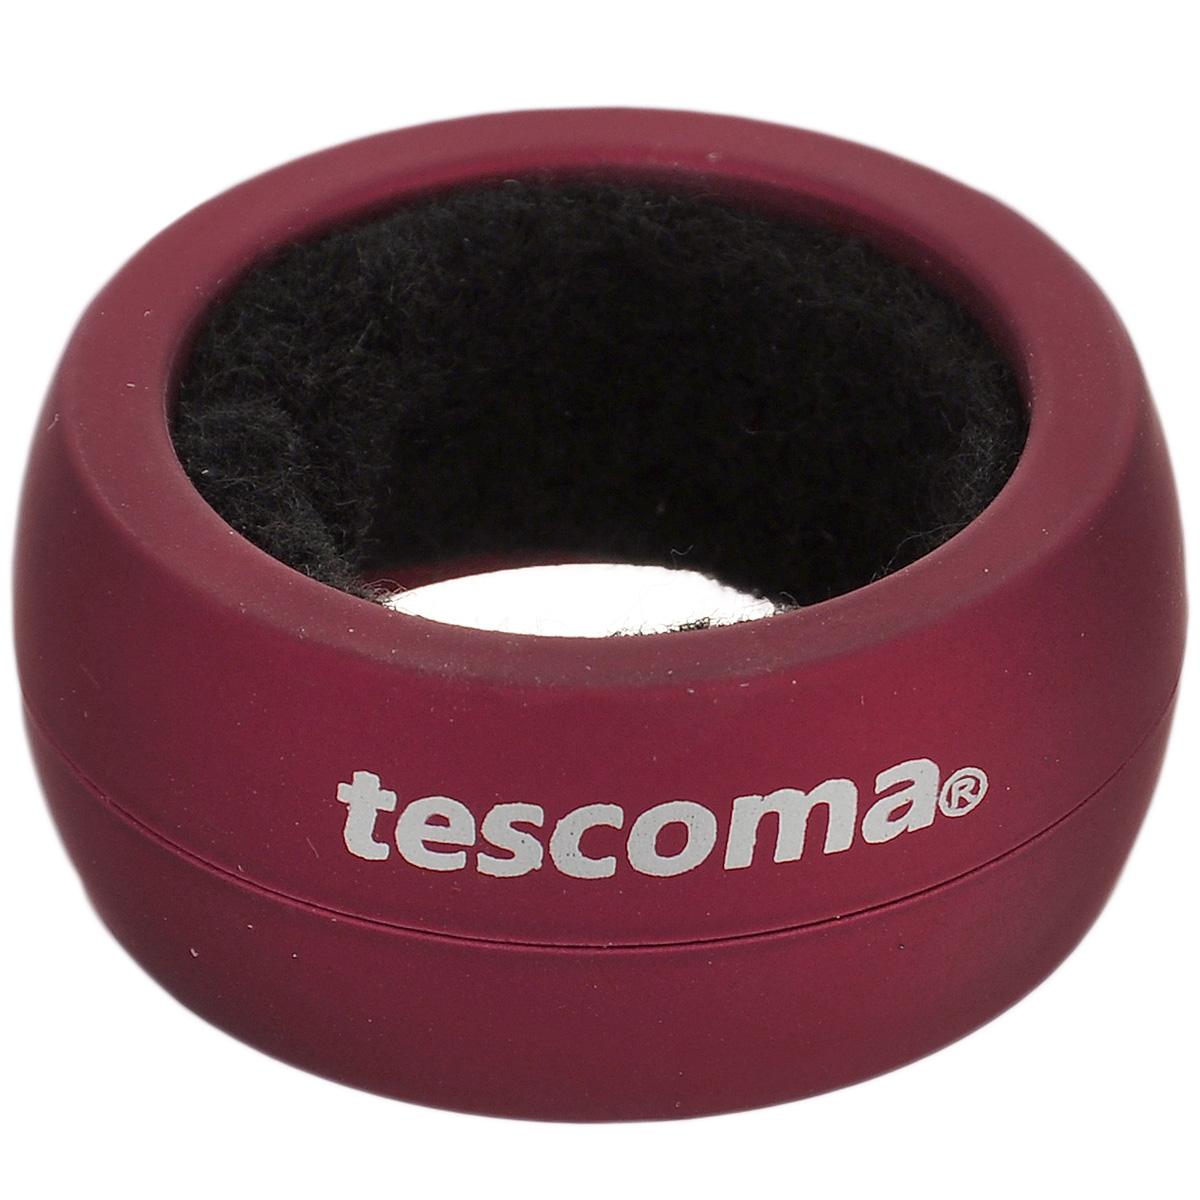 Кольцо для капель Tescoma Uno Vino, цвет: бордовый штопор сомелье tescoma uno vino 695412